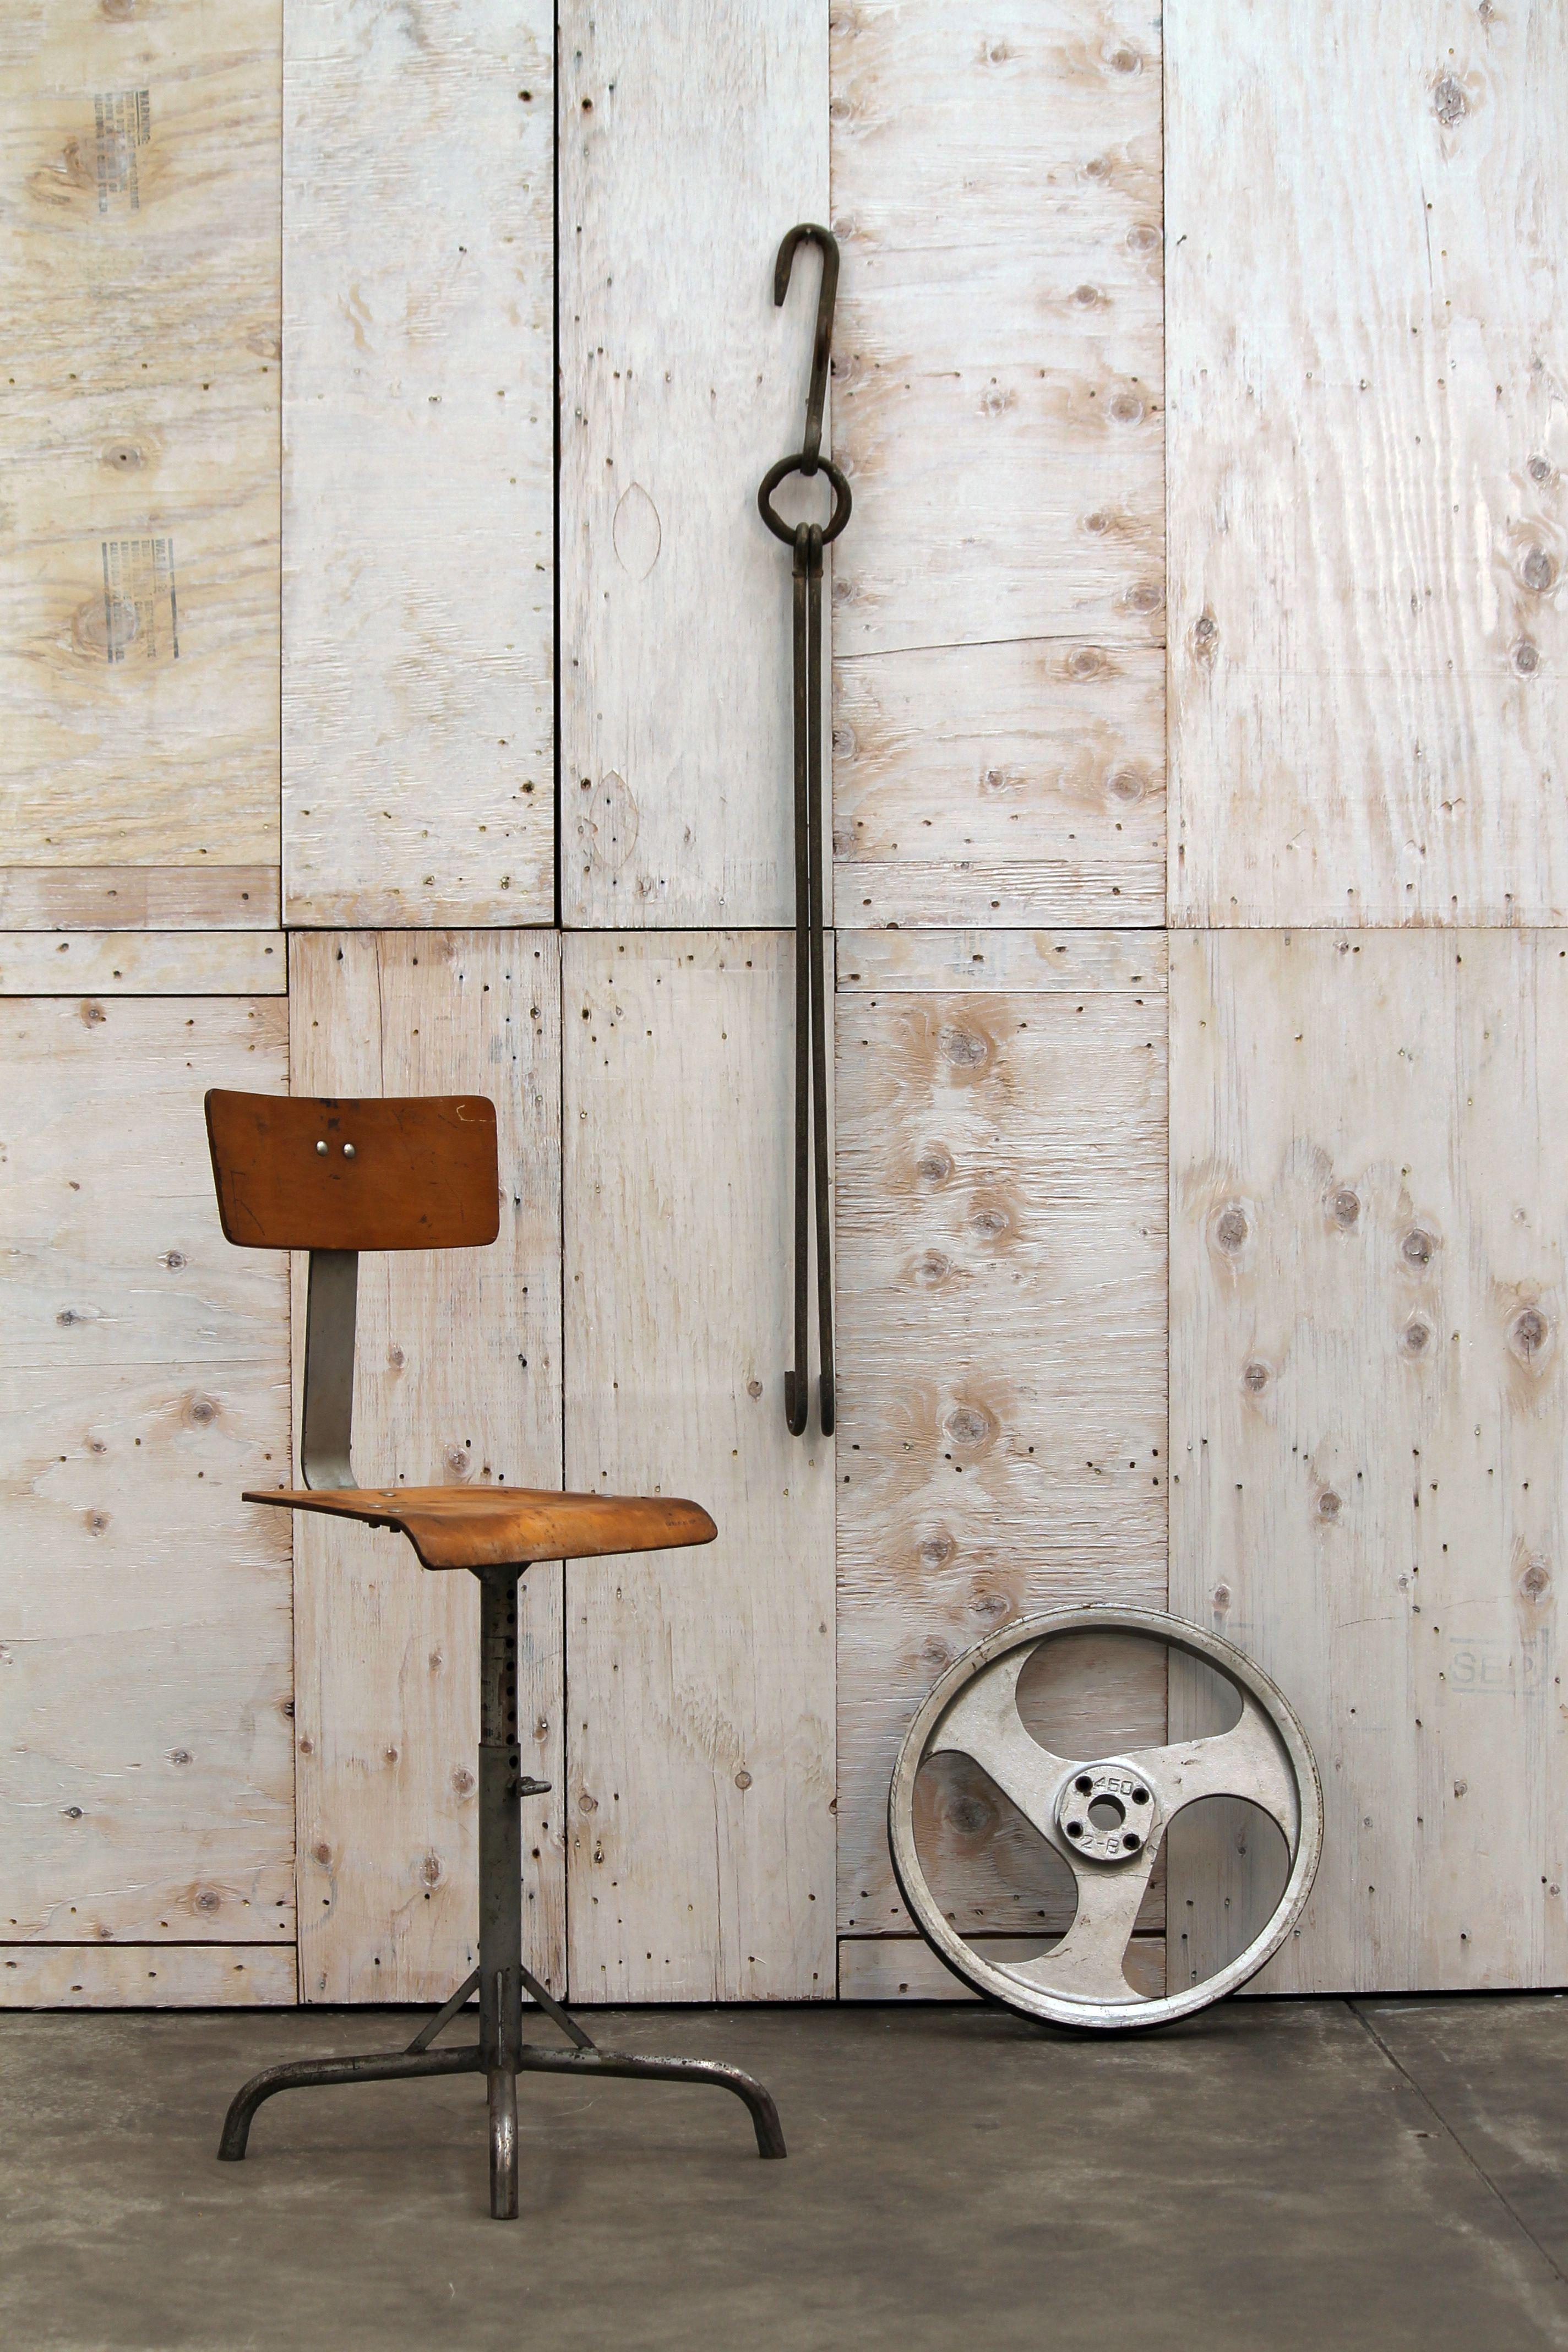 Sixties factory stool